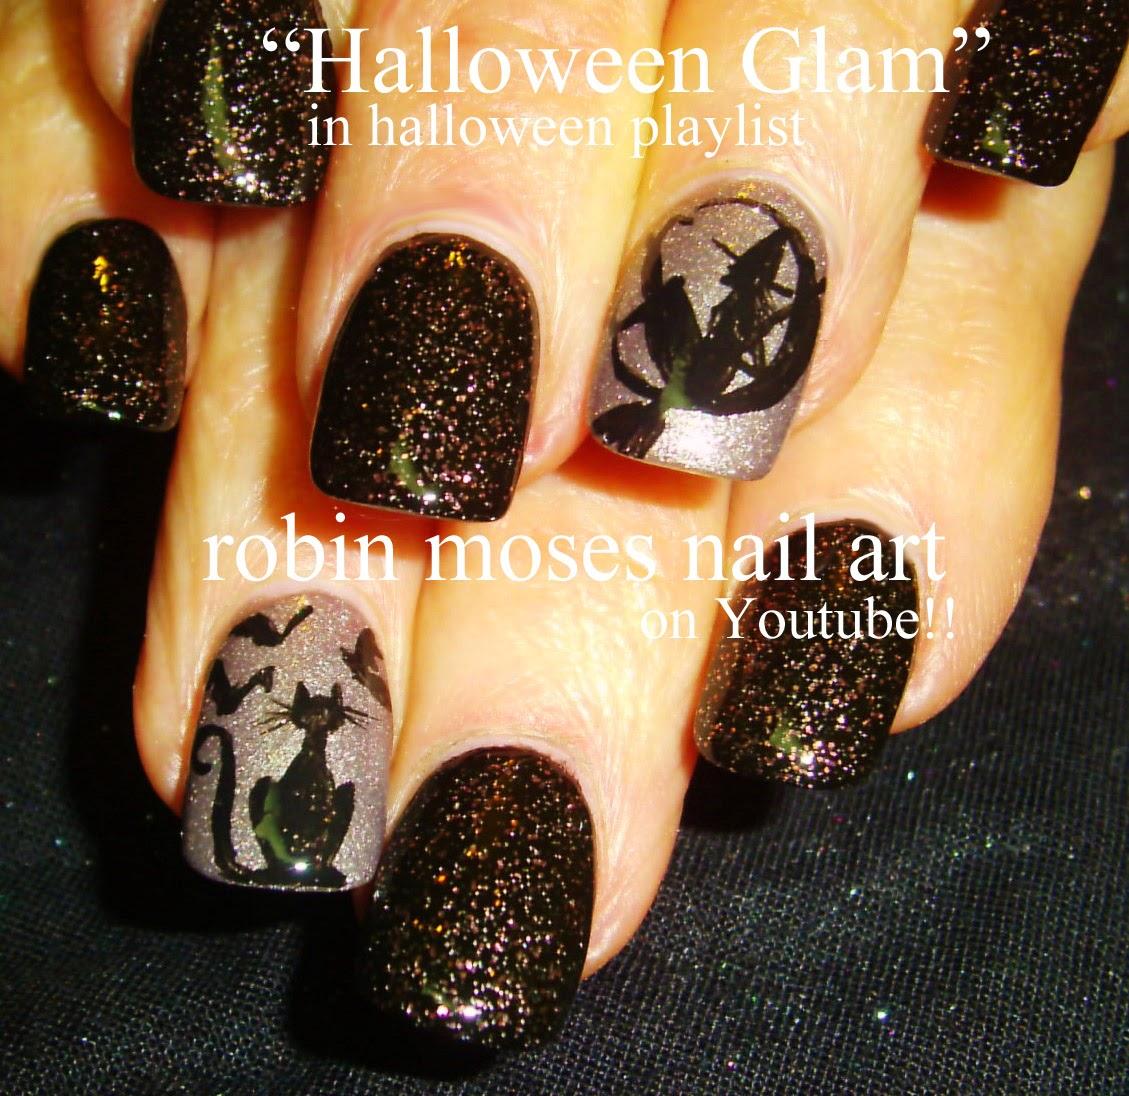 Robin moses nail art halloween nails halloween nail art pink nail art tutorials halloween nails diy easy halloween for beginners and up halloween nail art designs tutorial prinsesfo Choice Image